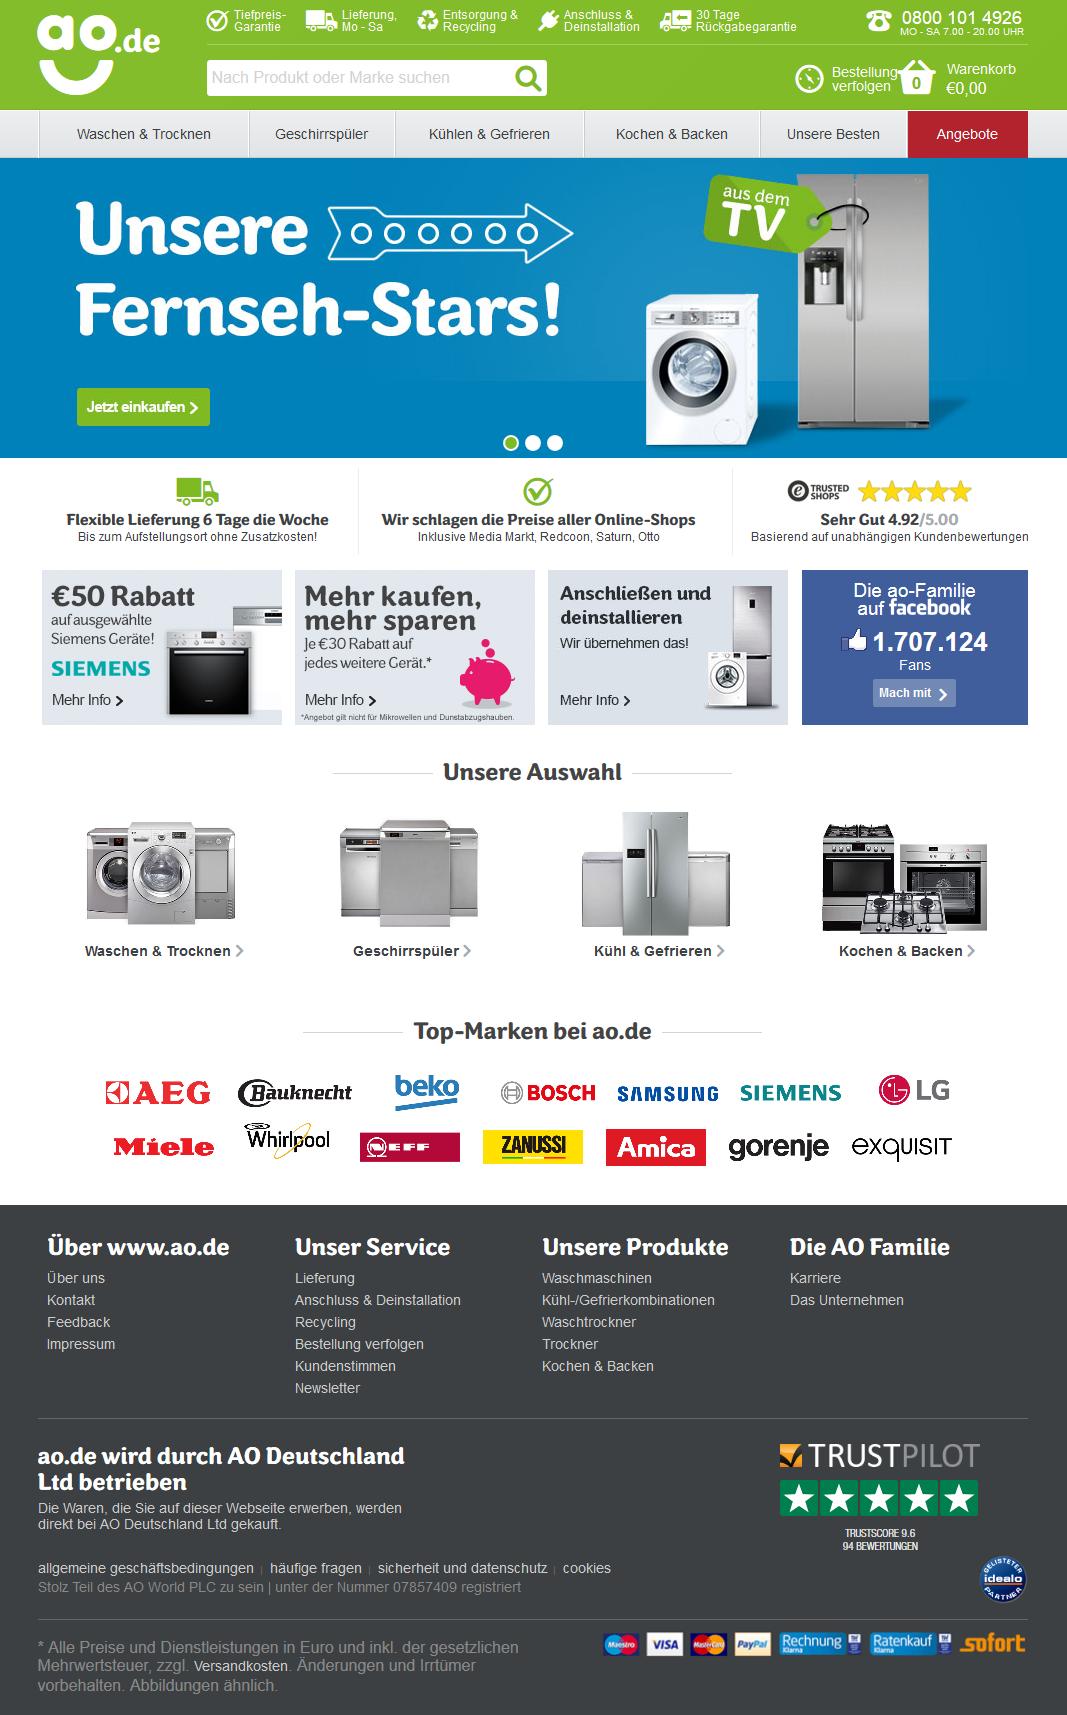 ao.de Homepage Screenshot